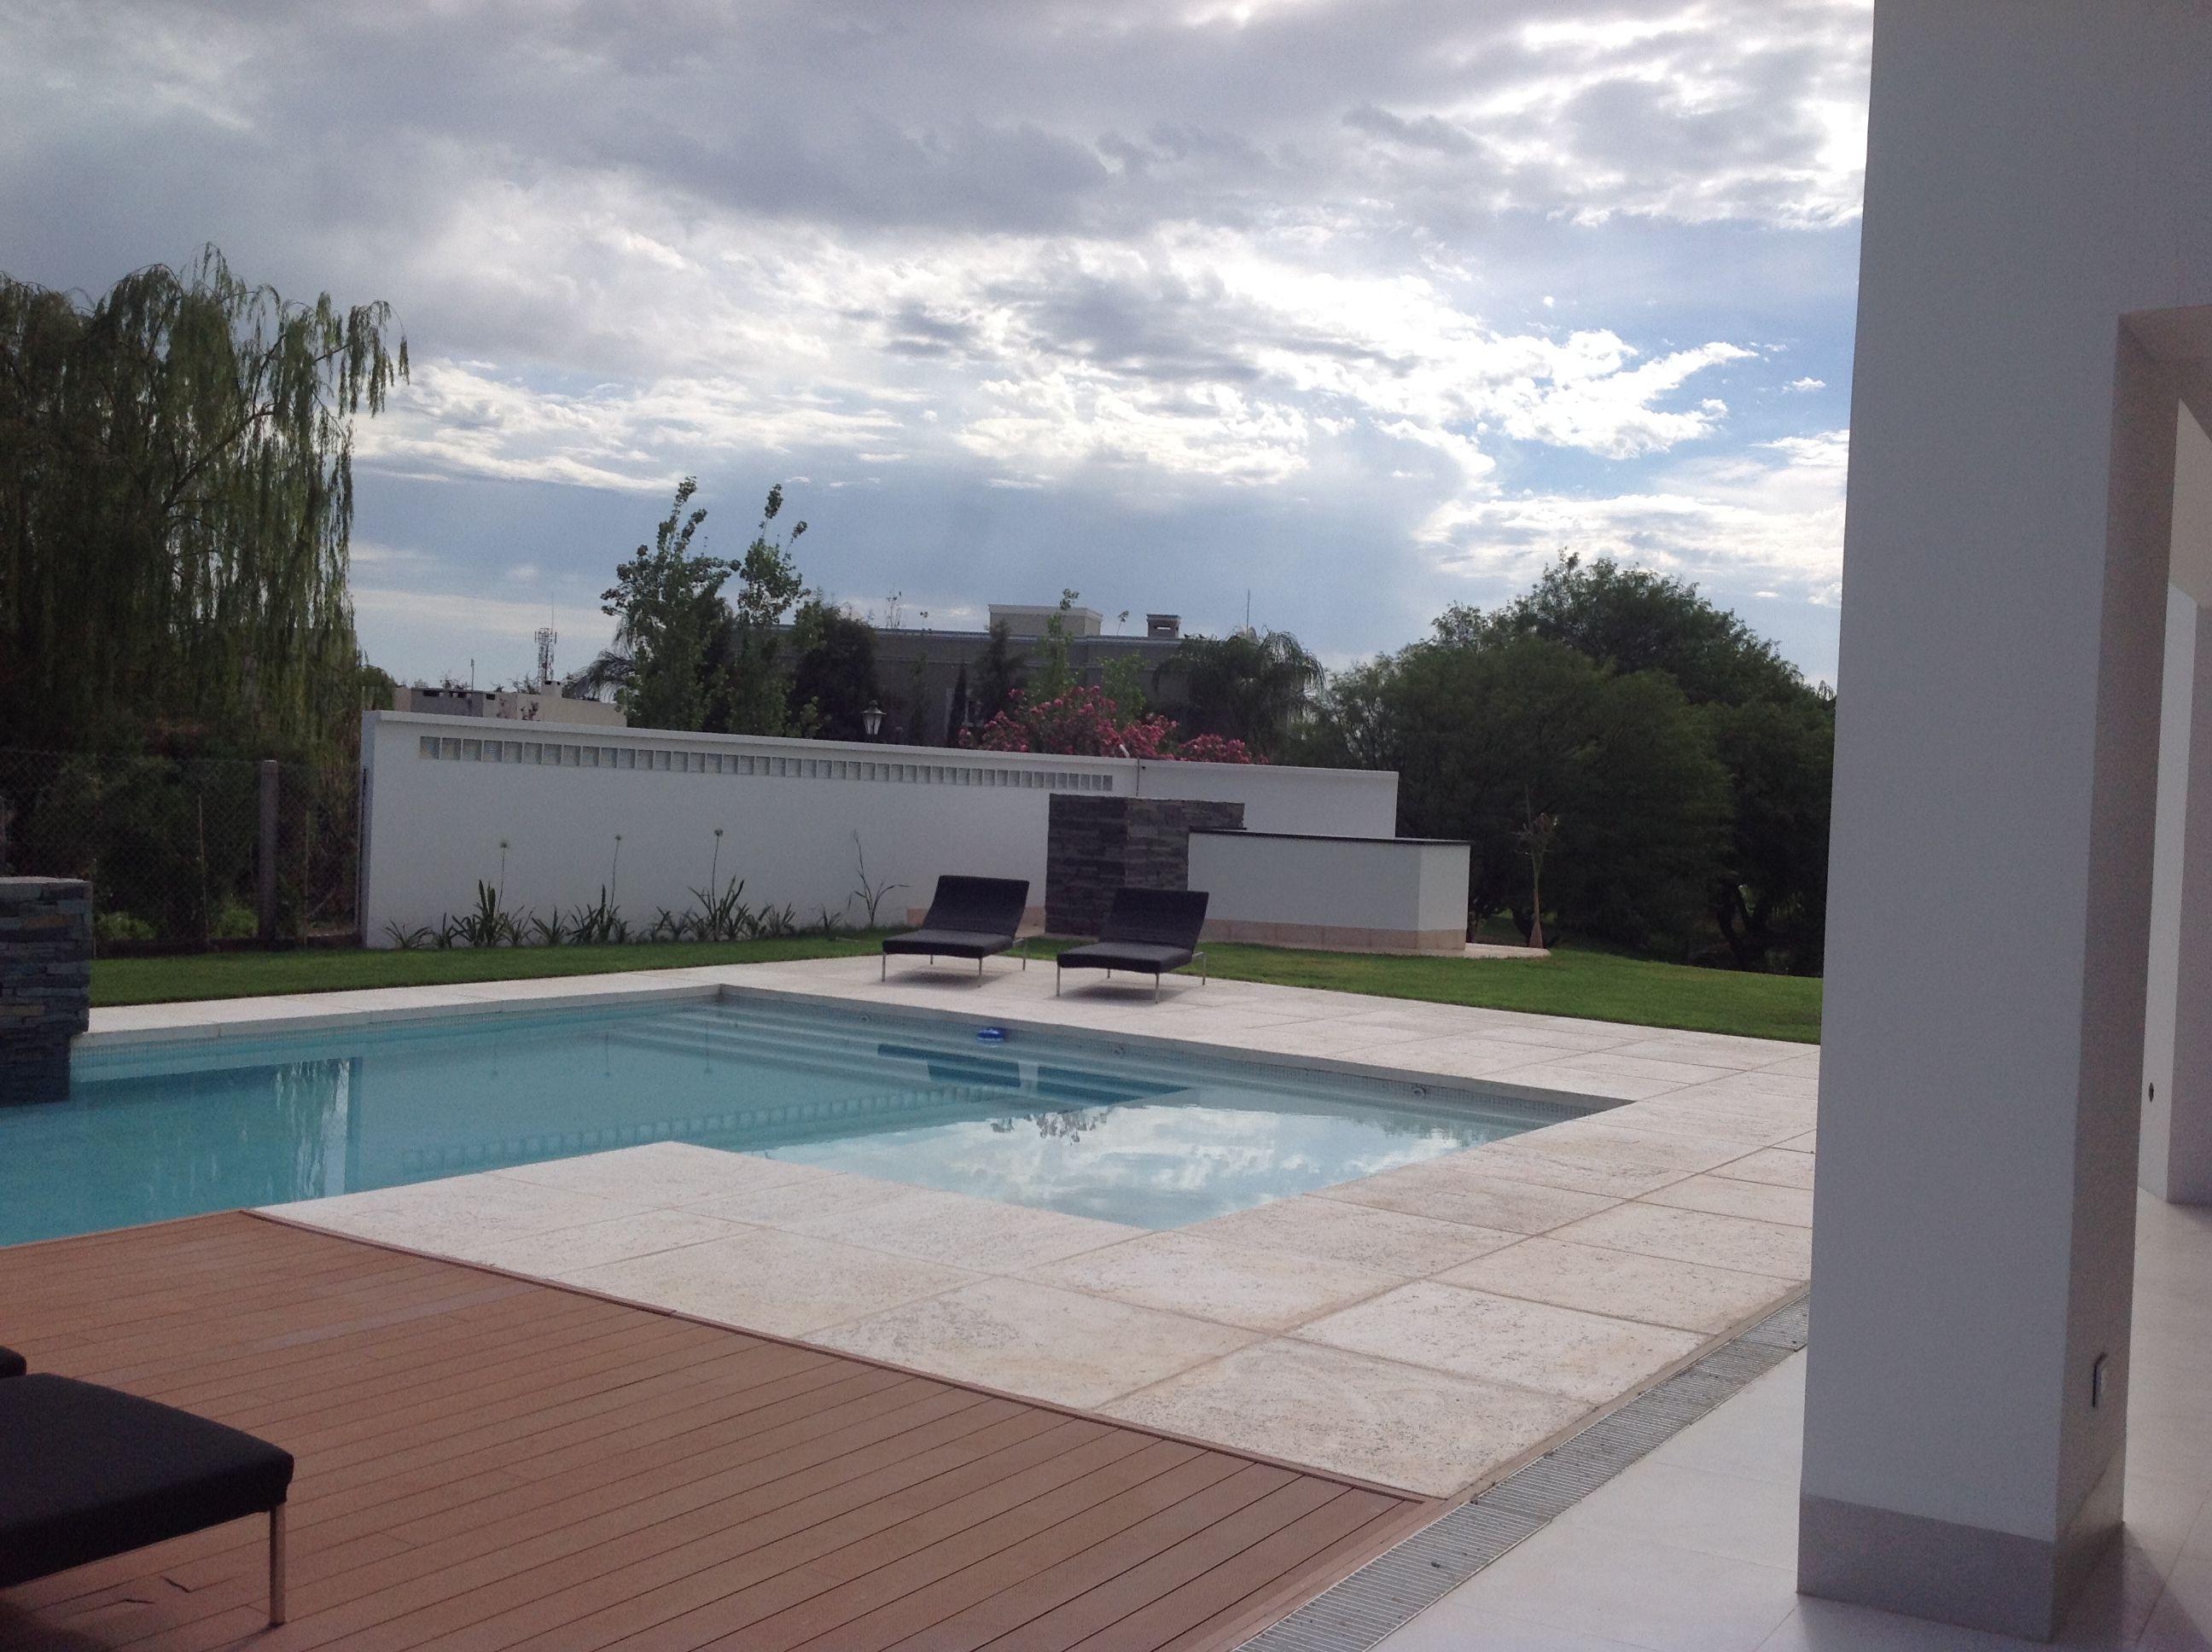 piscina + swinning pool + diseño + muro revestimiento en piedra +